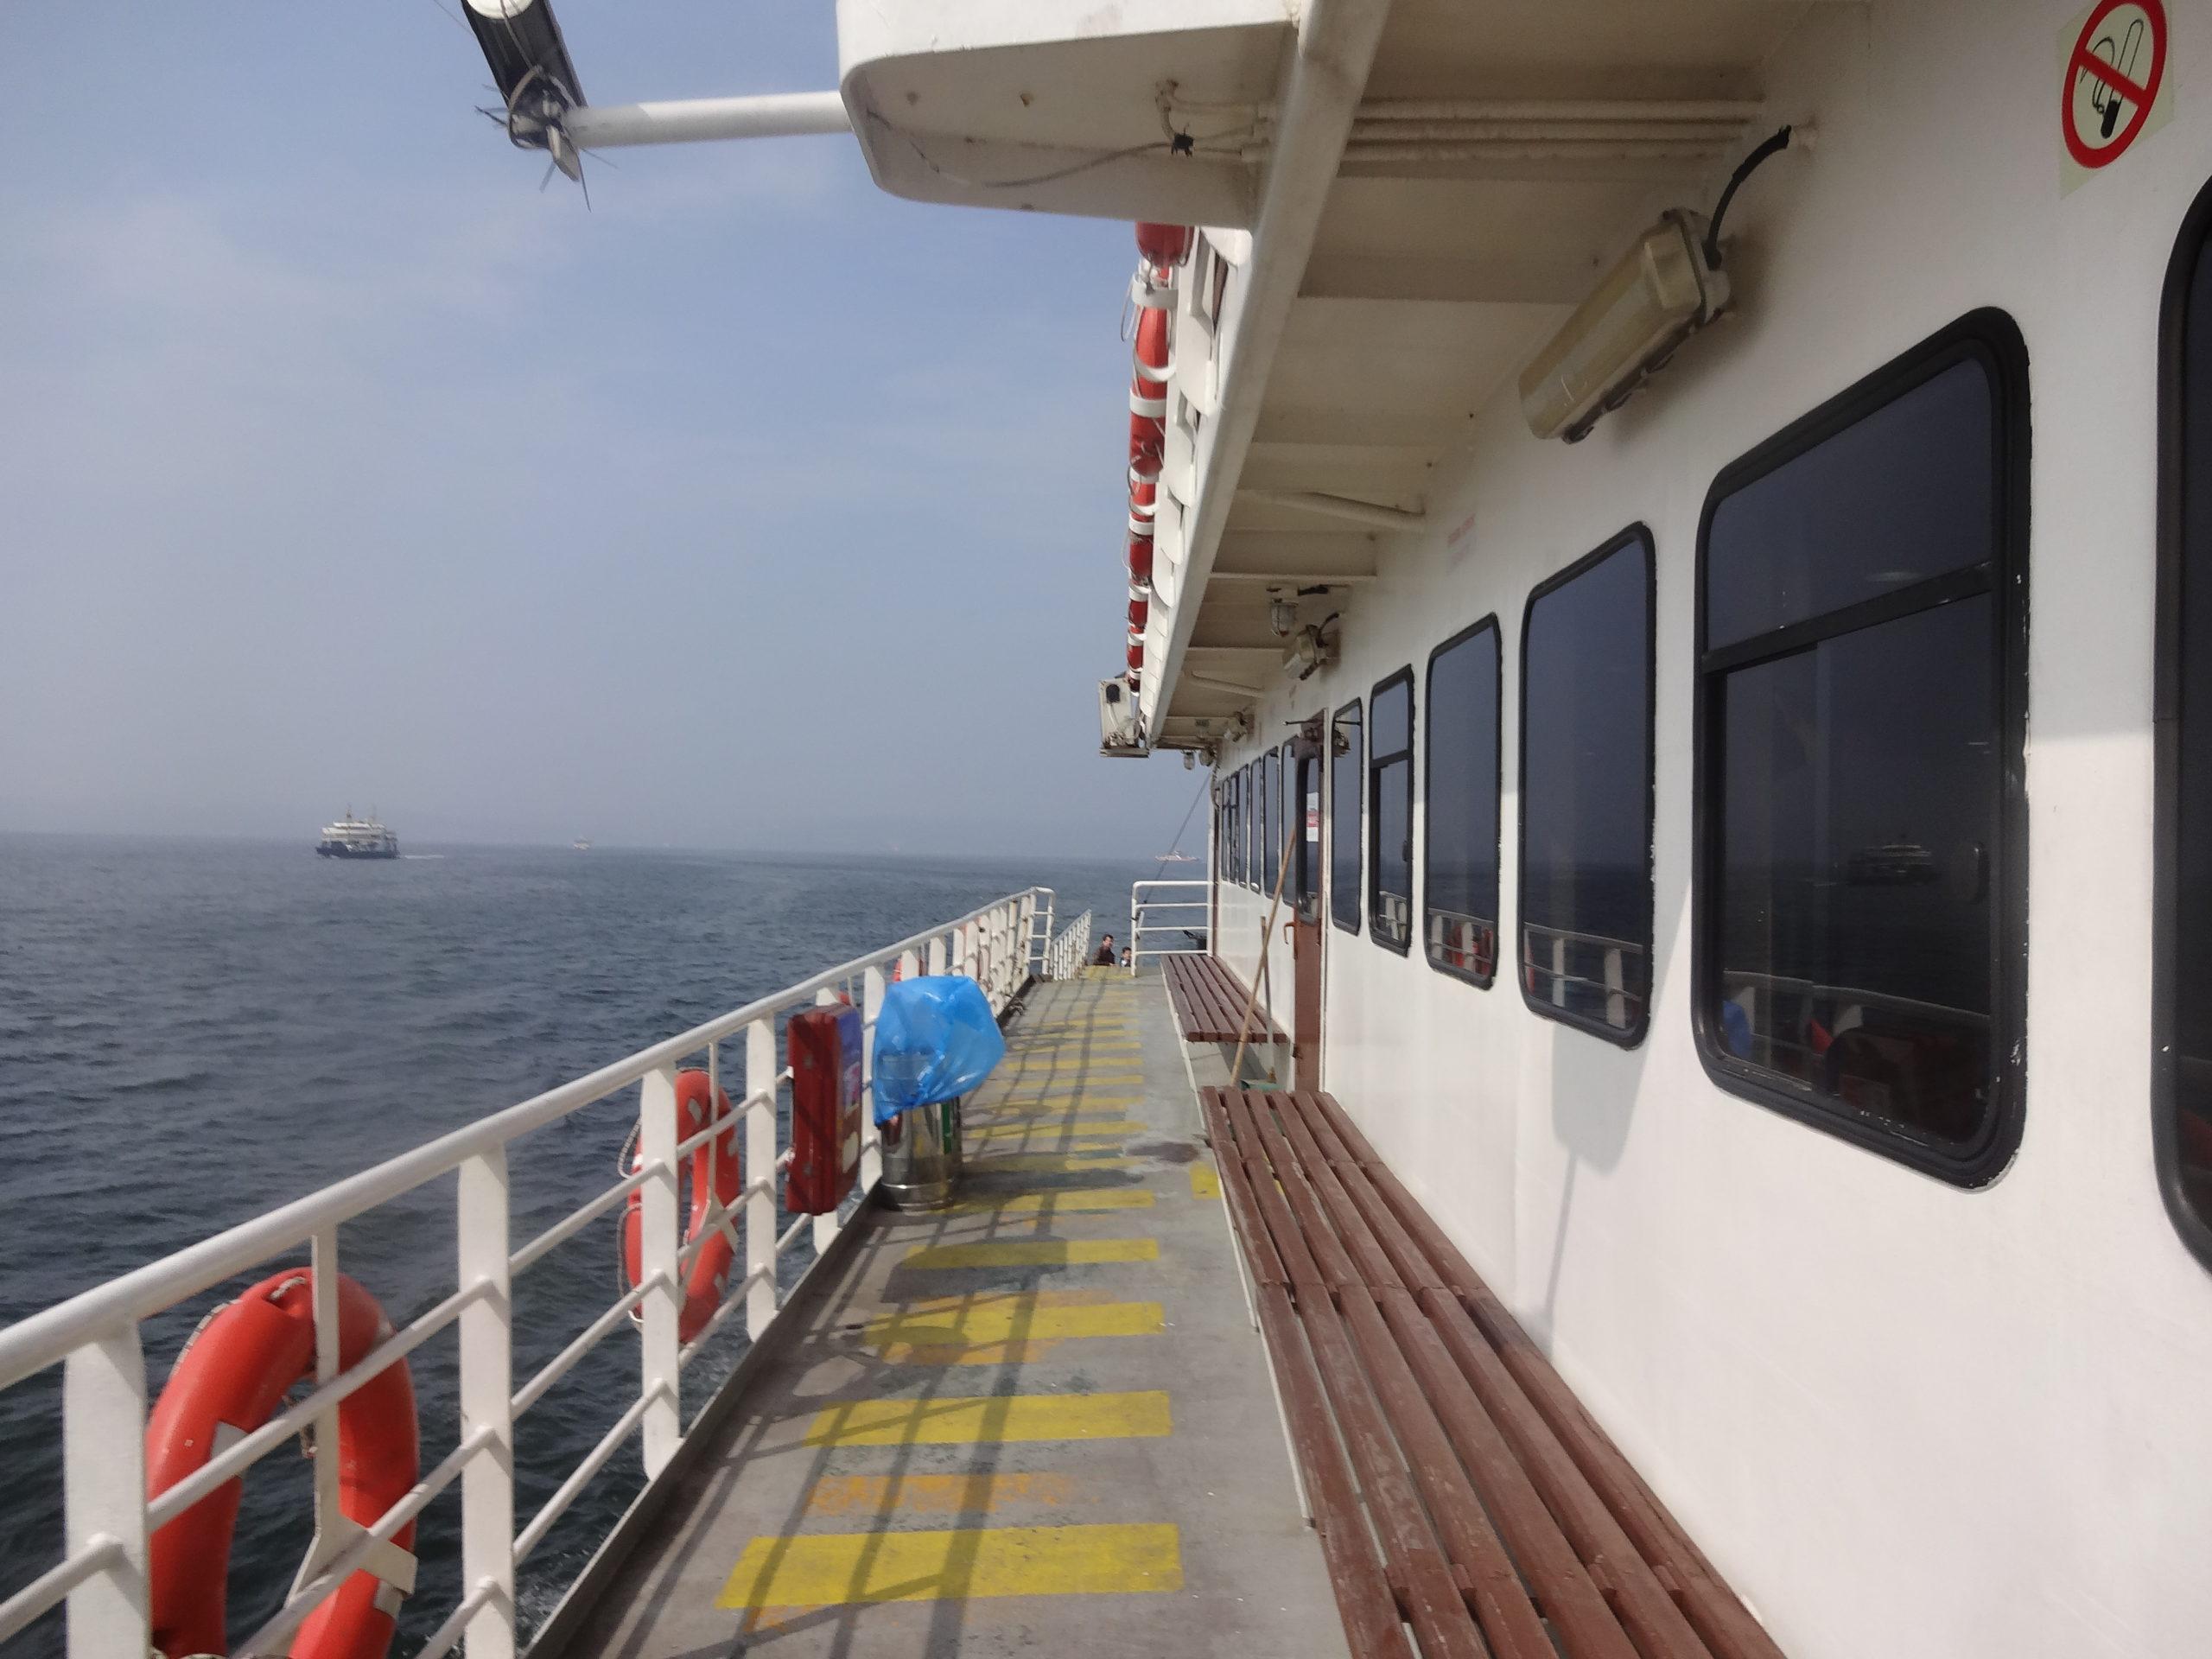 Yalova港に向かうフェリー